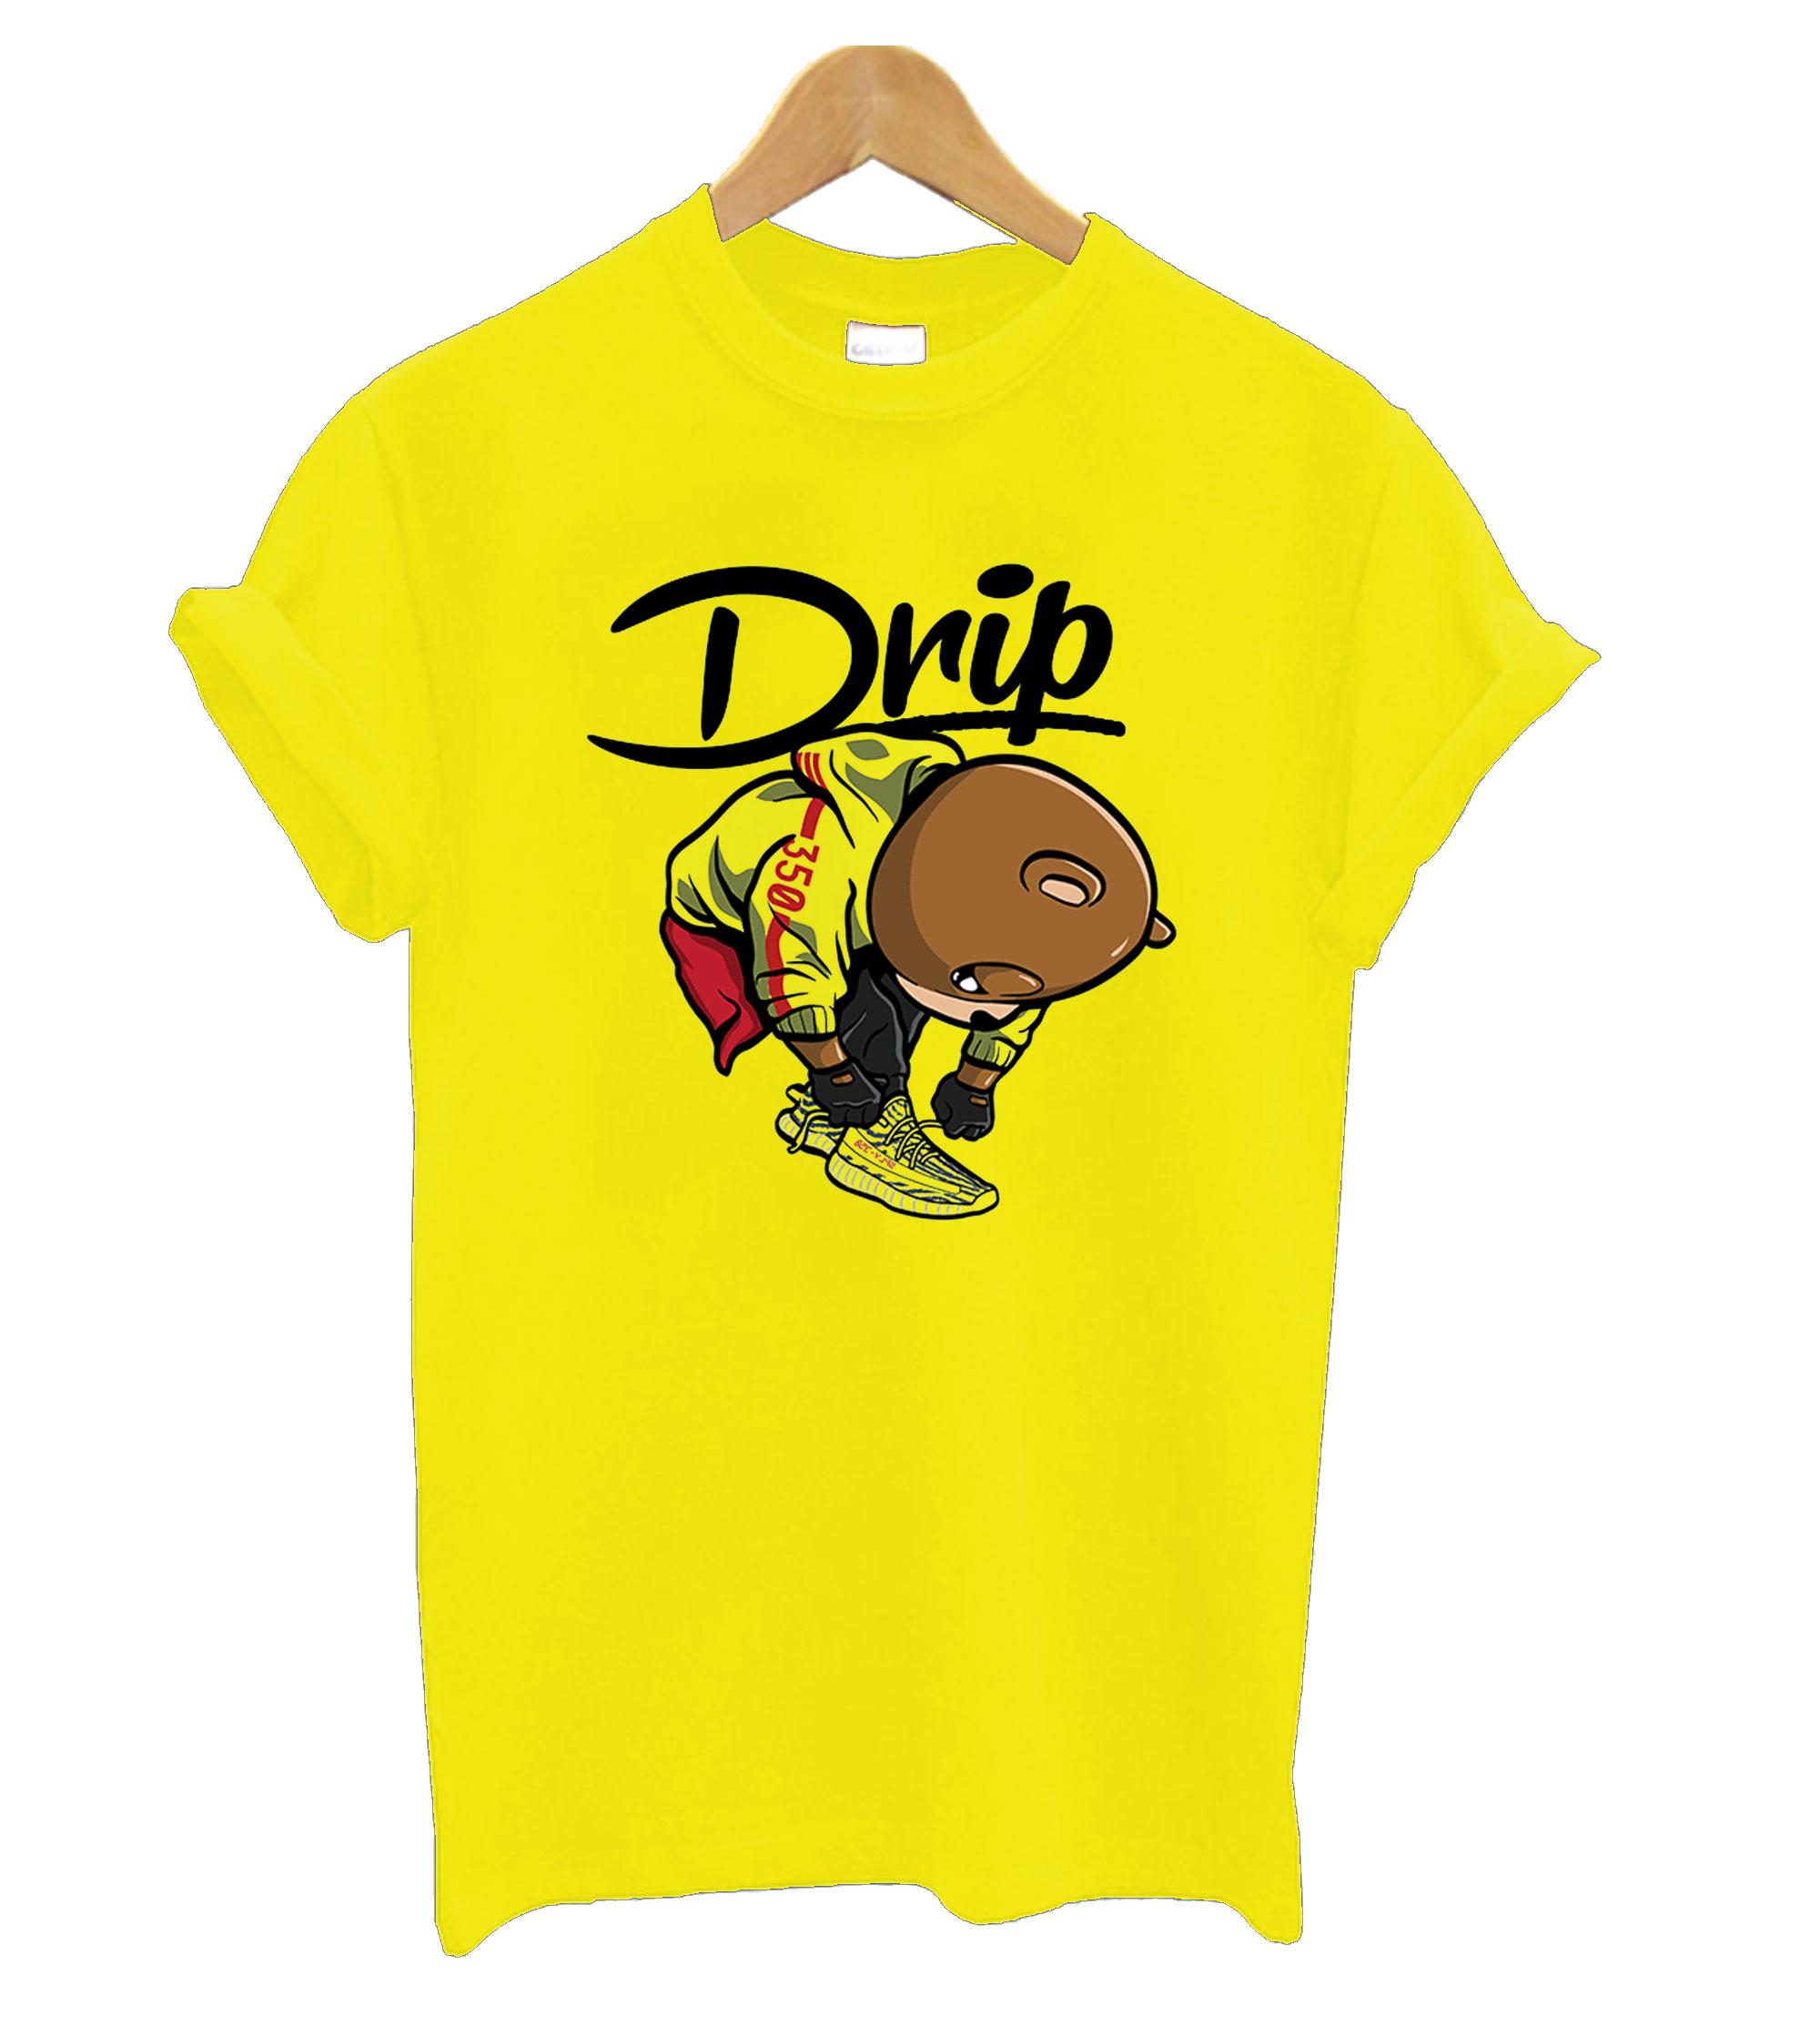 Frozen Yellow Yeezys - New Drip T shirt IGS